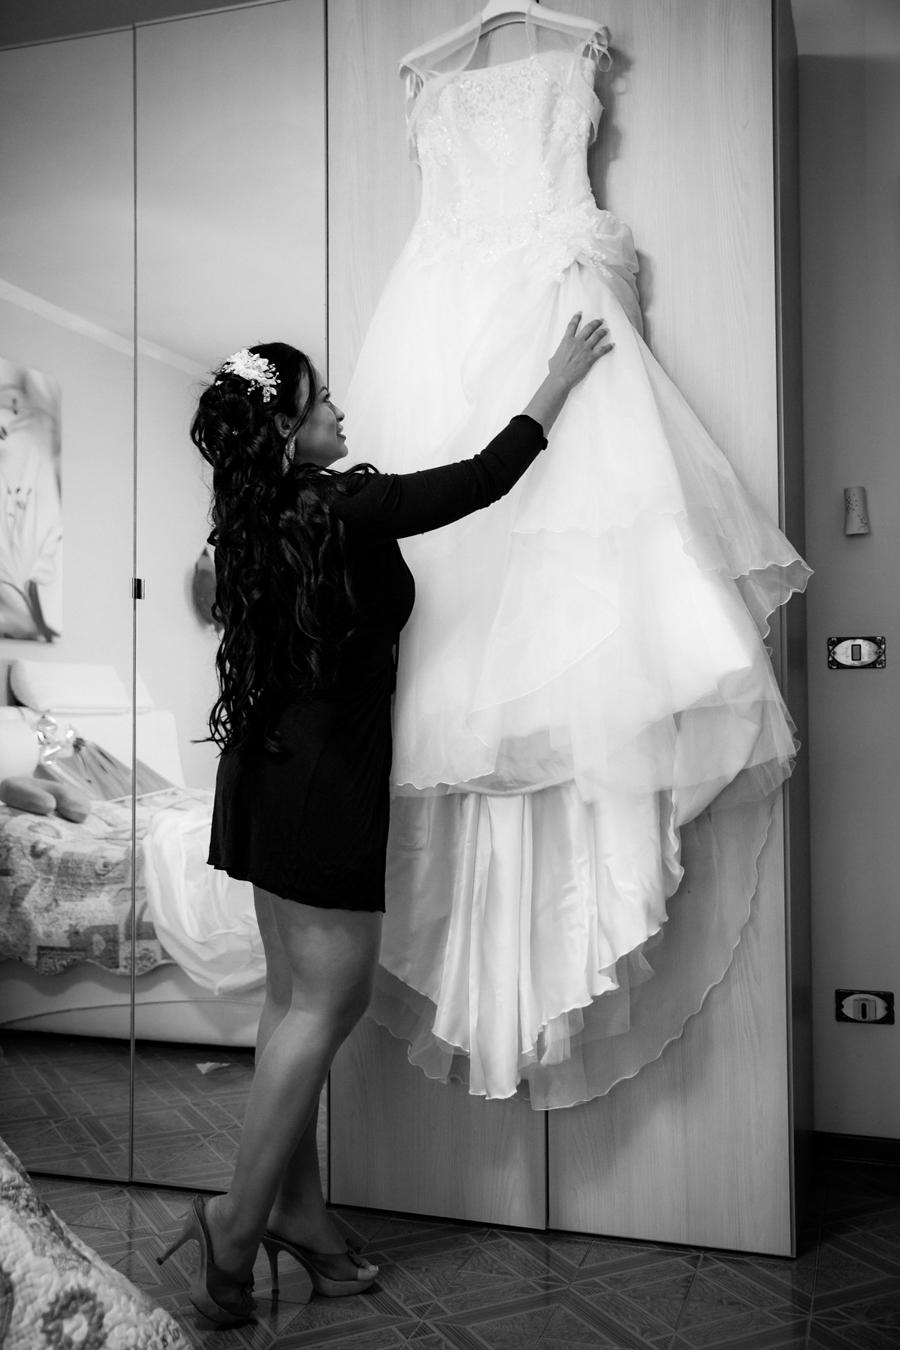 Weddingdestination-Storytelling-Renato-Zanette-Fotografo-Fregona-Treviso-Veneto